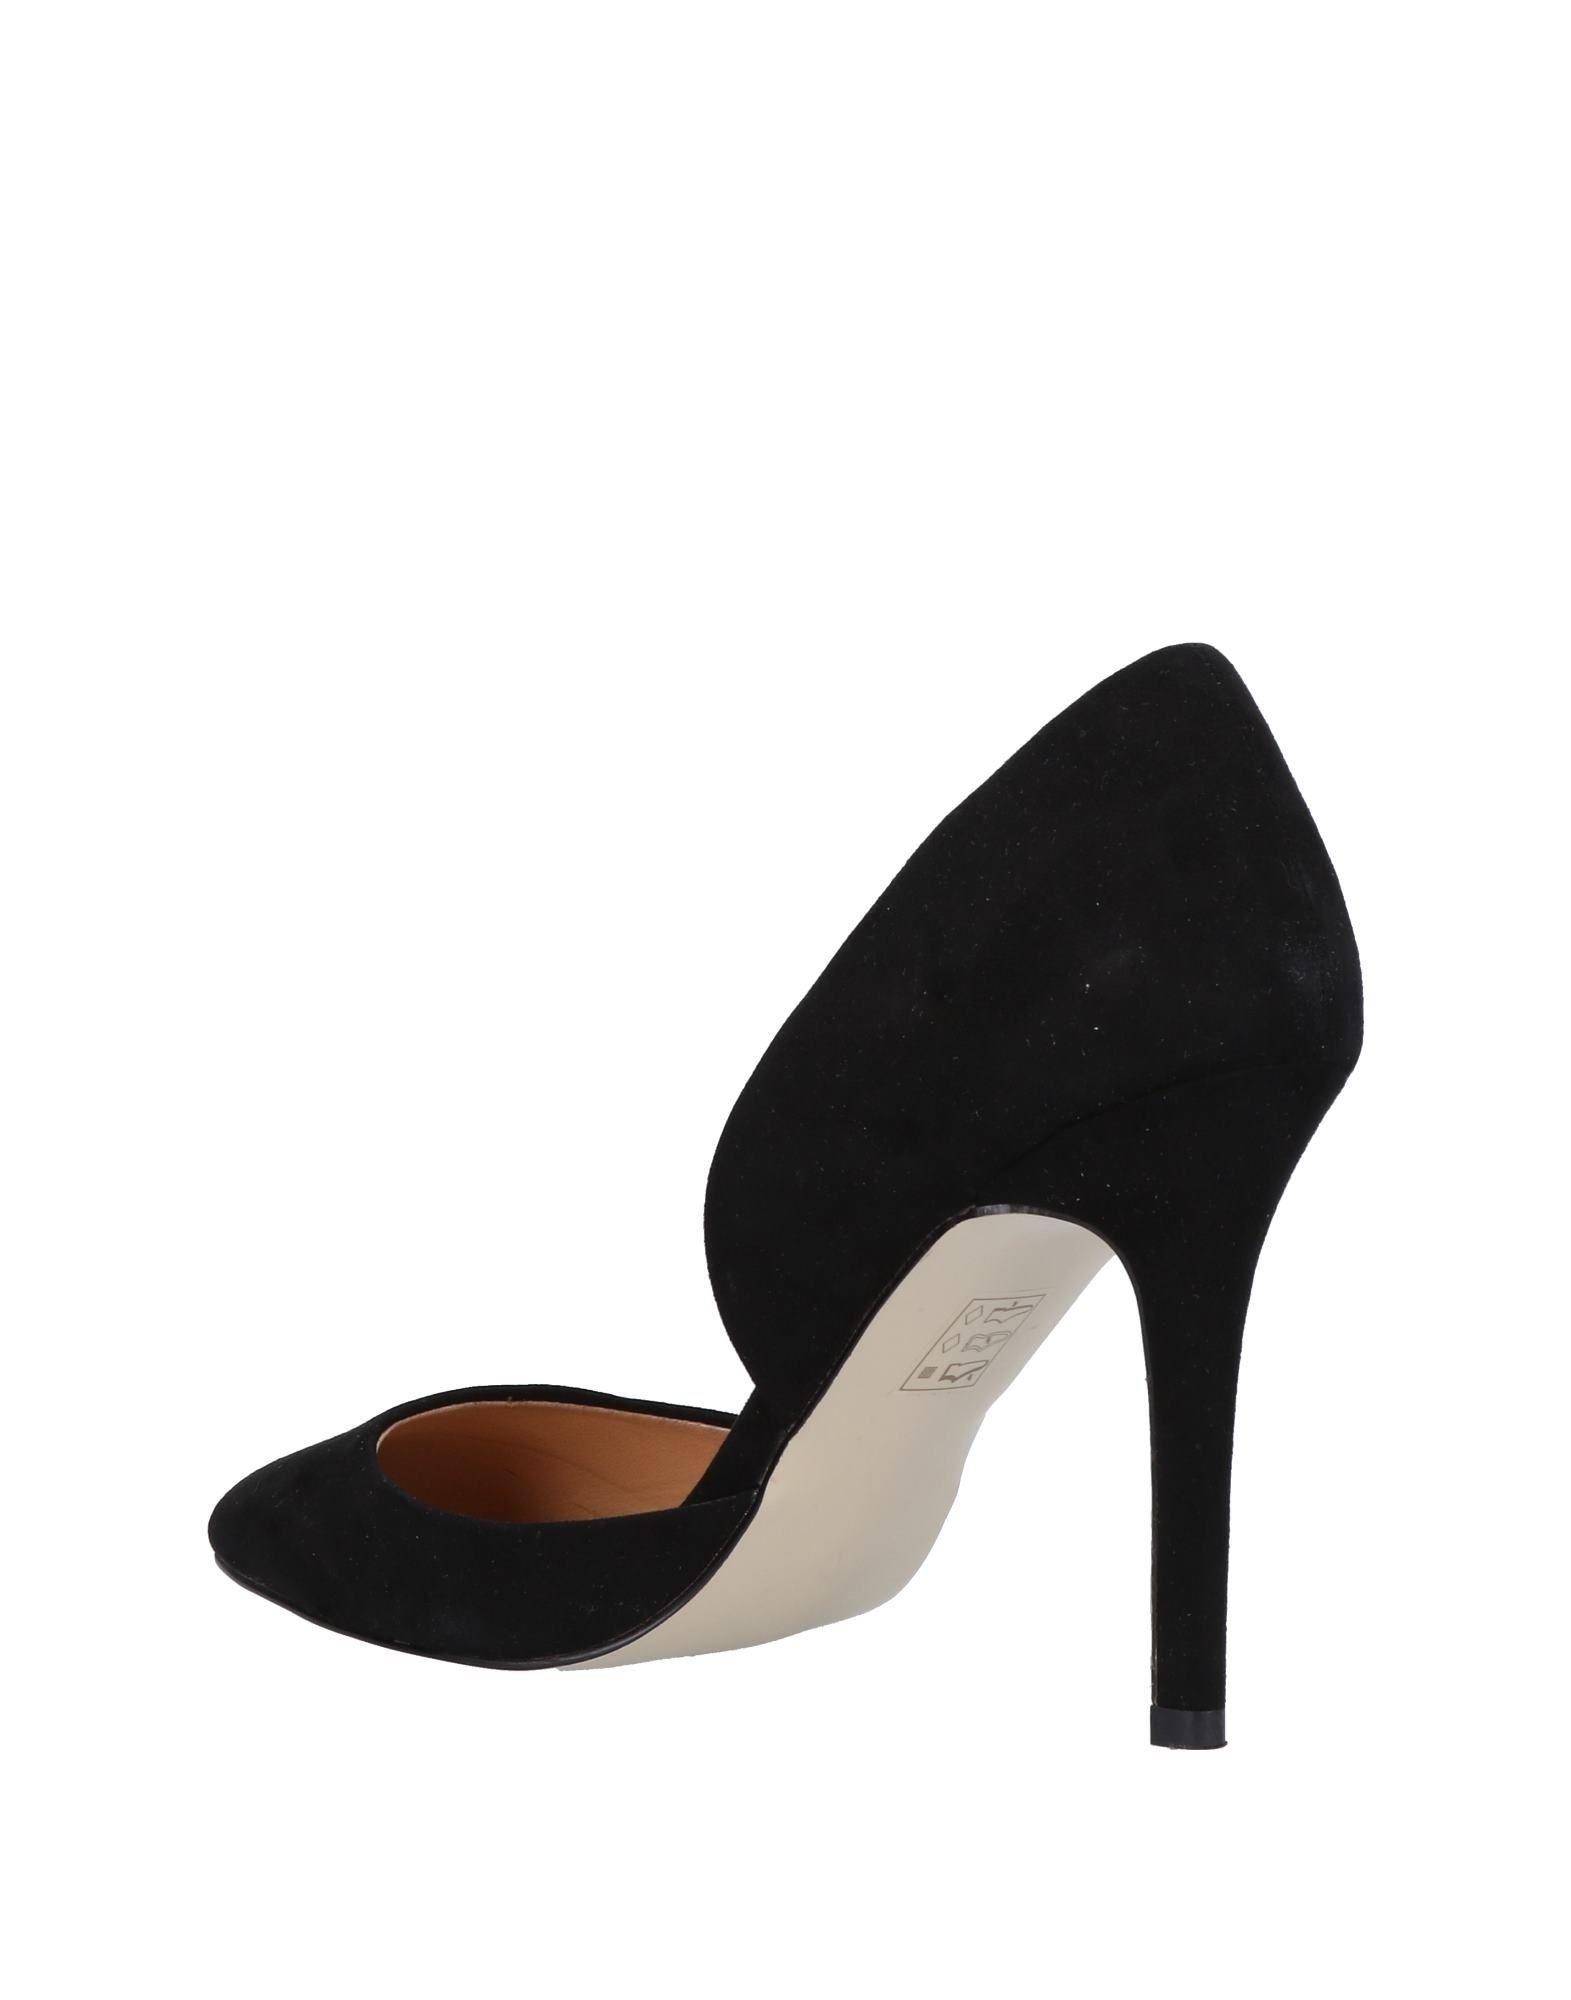 Head Over Heels Gute Pumps Damen  11471341KB Gute Heels Qualität beliebte Schuhe c88376